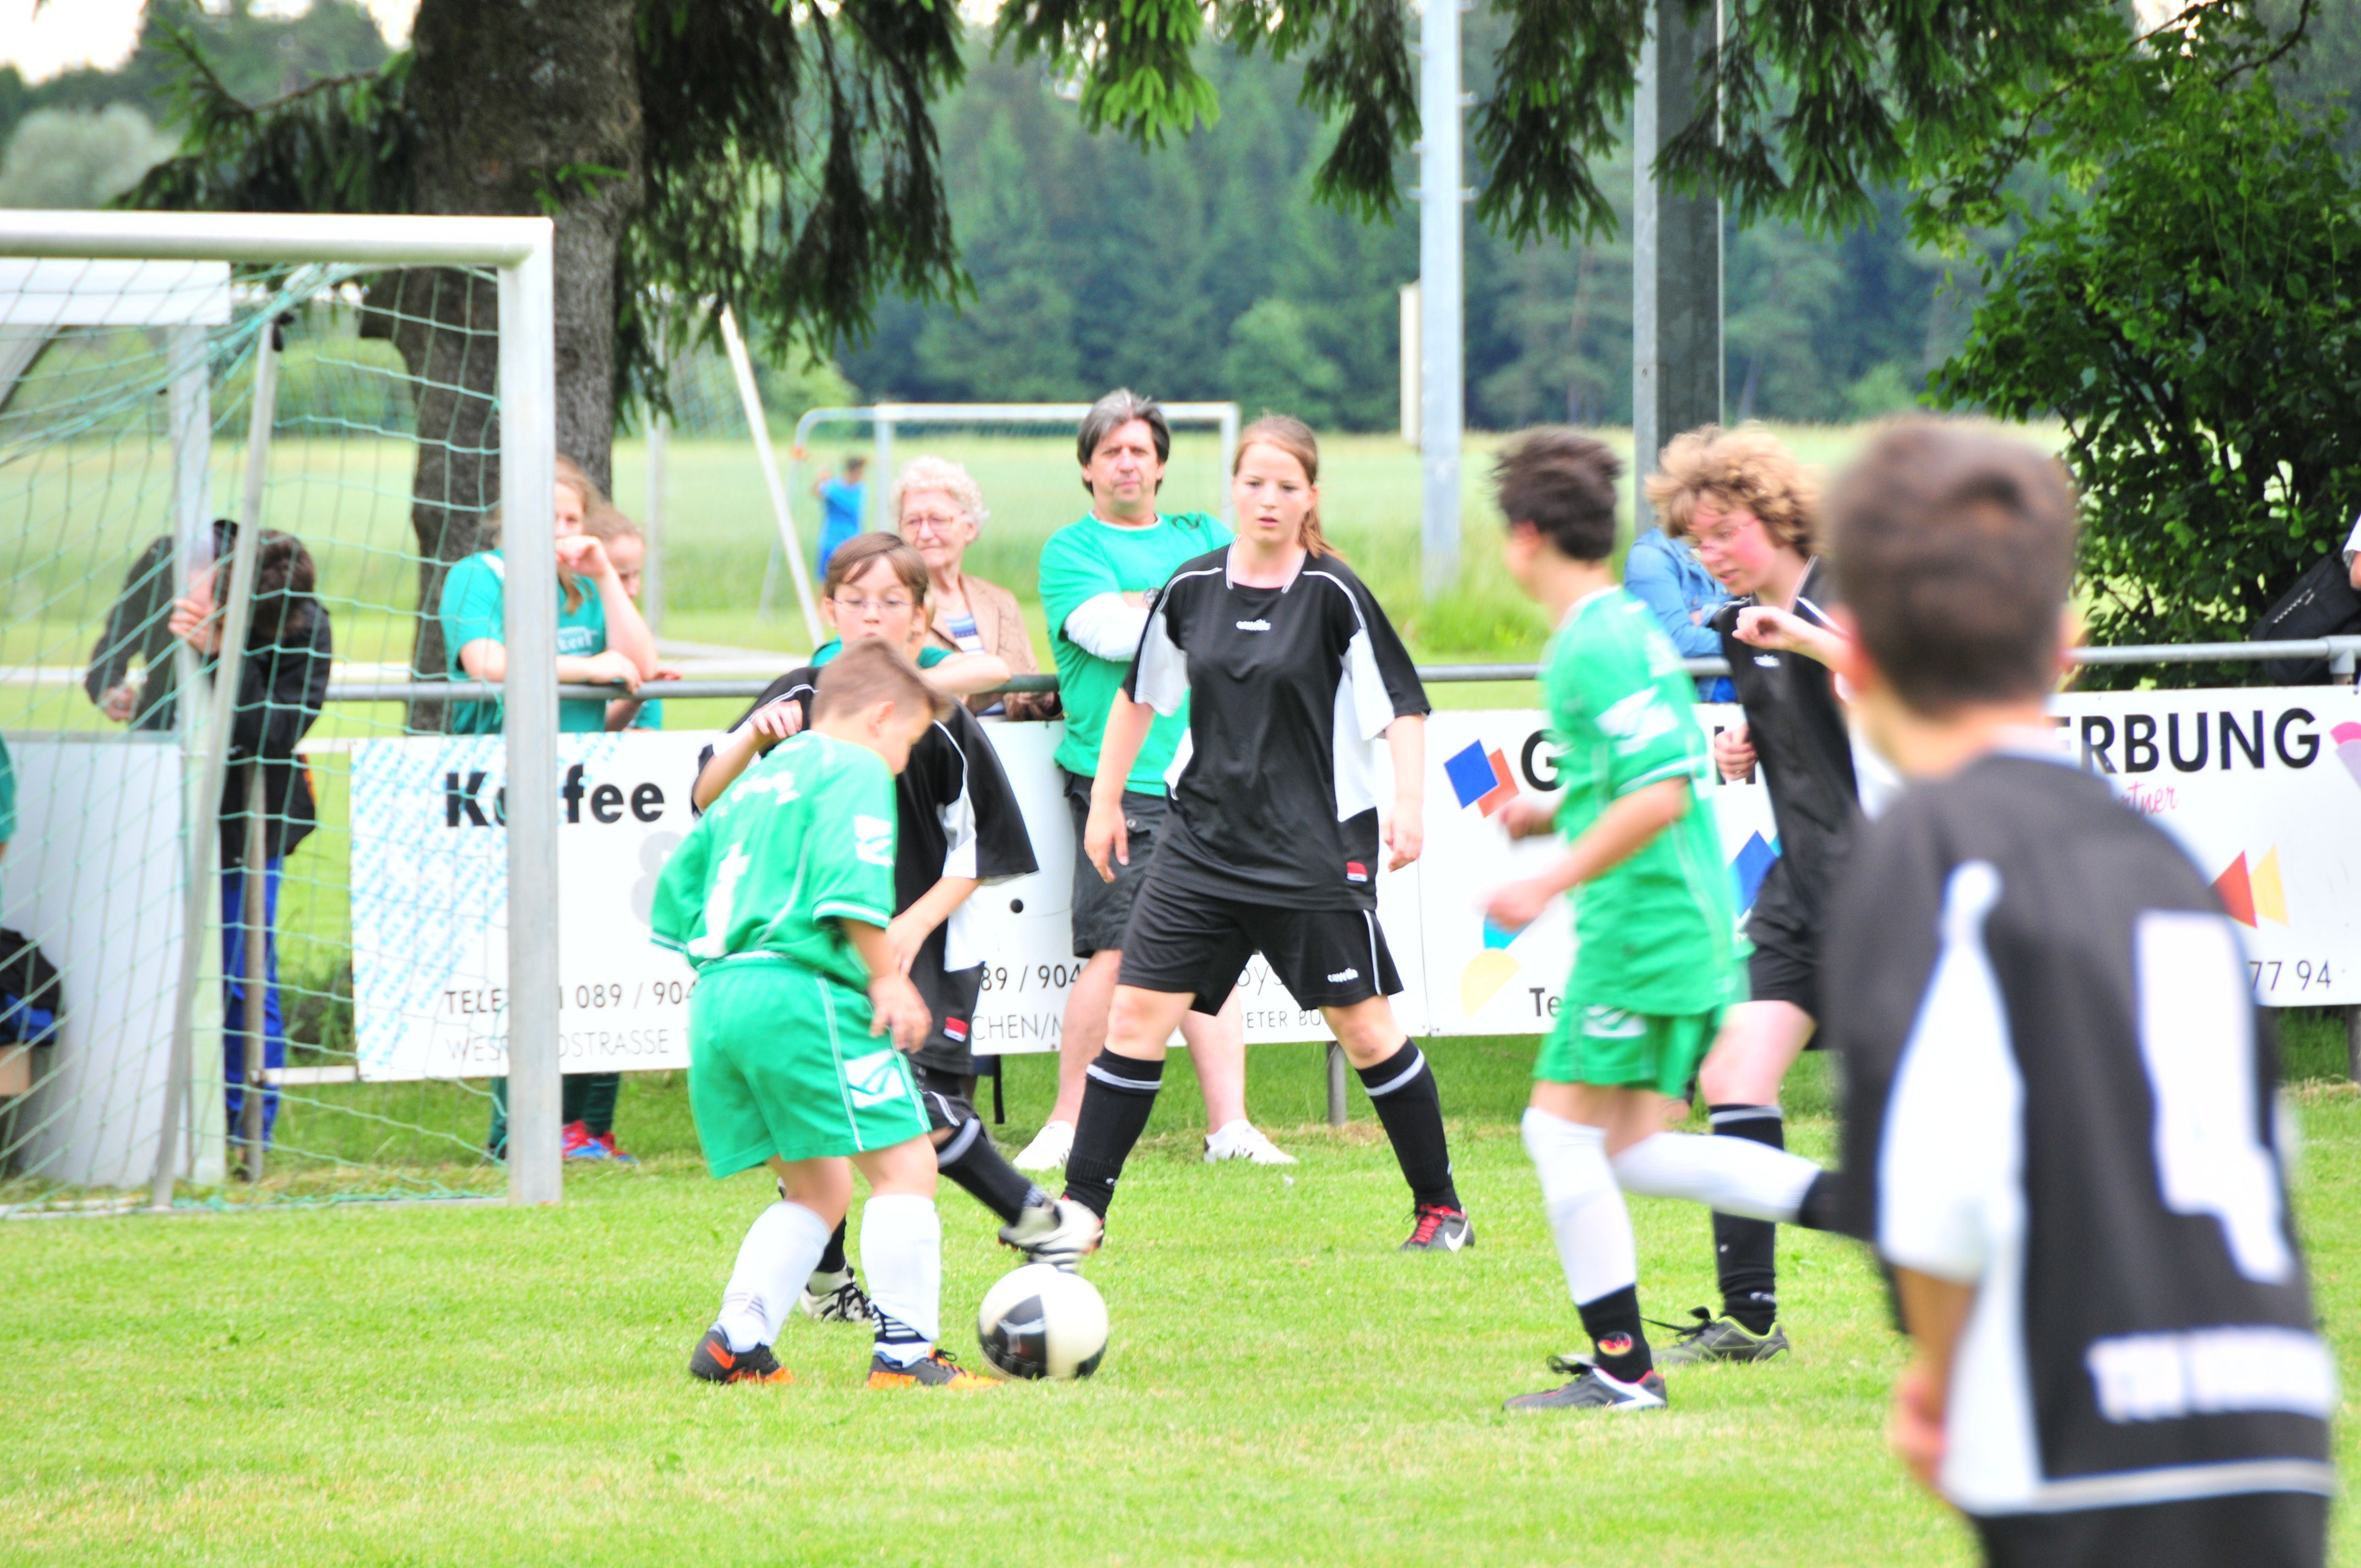 Inklusions-Fußball kommt voran: Szene aus dem Spiel TSV Forstenried (grün) gegen den TSV Hohenbrunn.